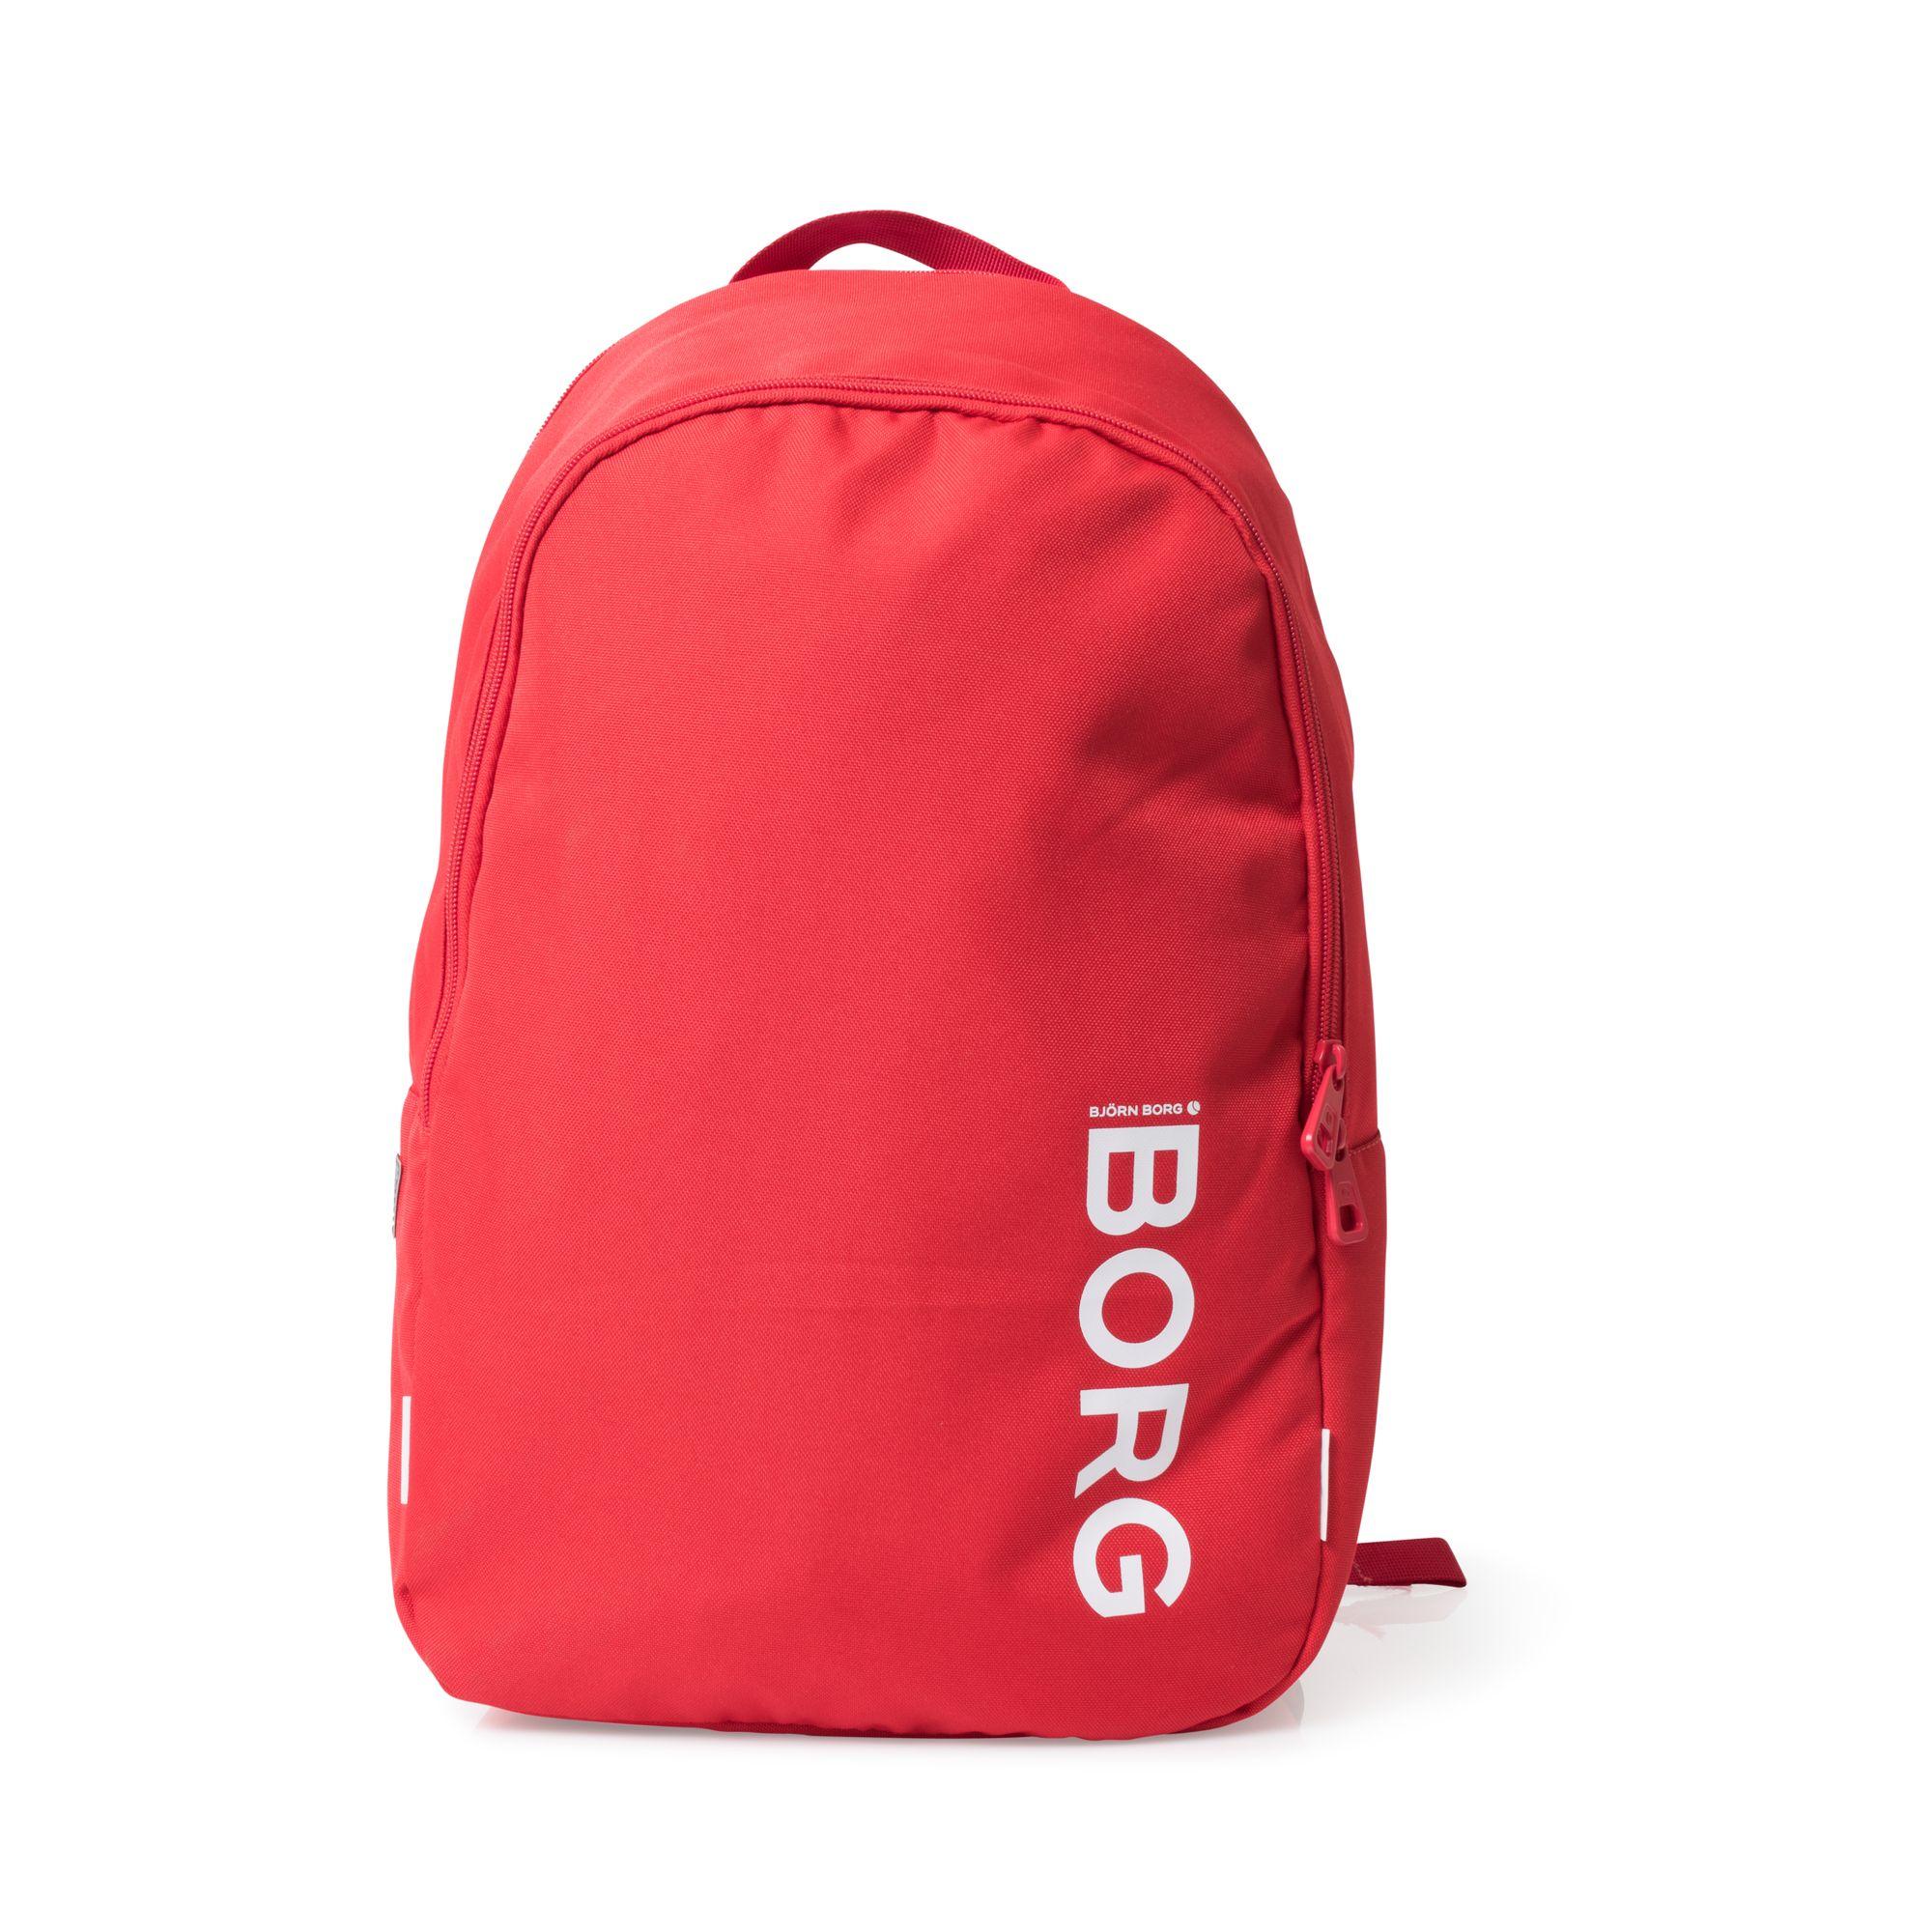 Björn Borg Core 7043 ryggsäck, Röd